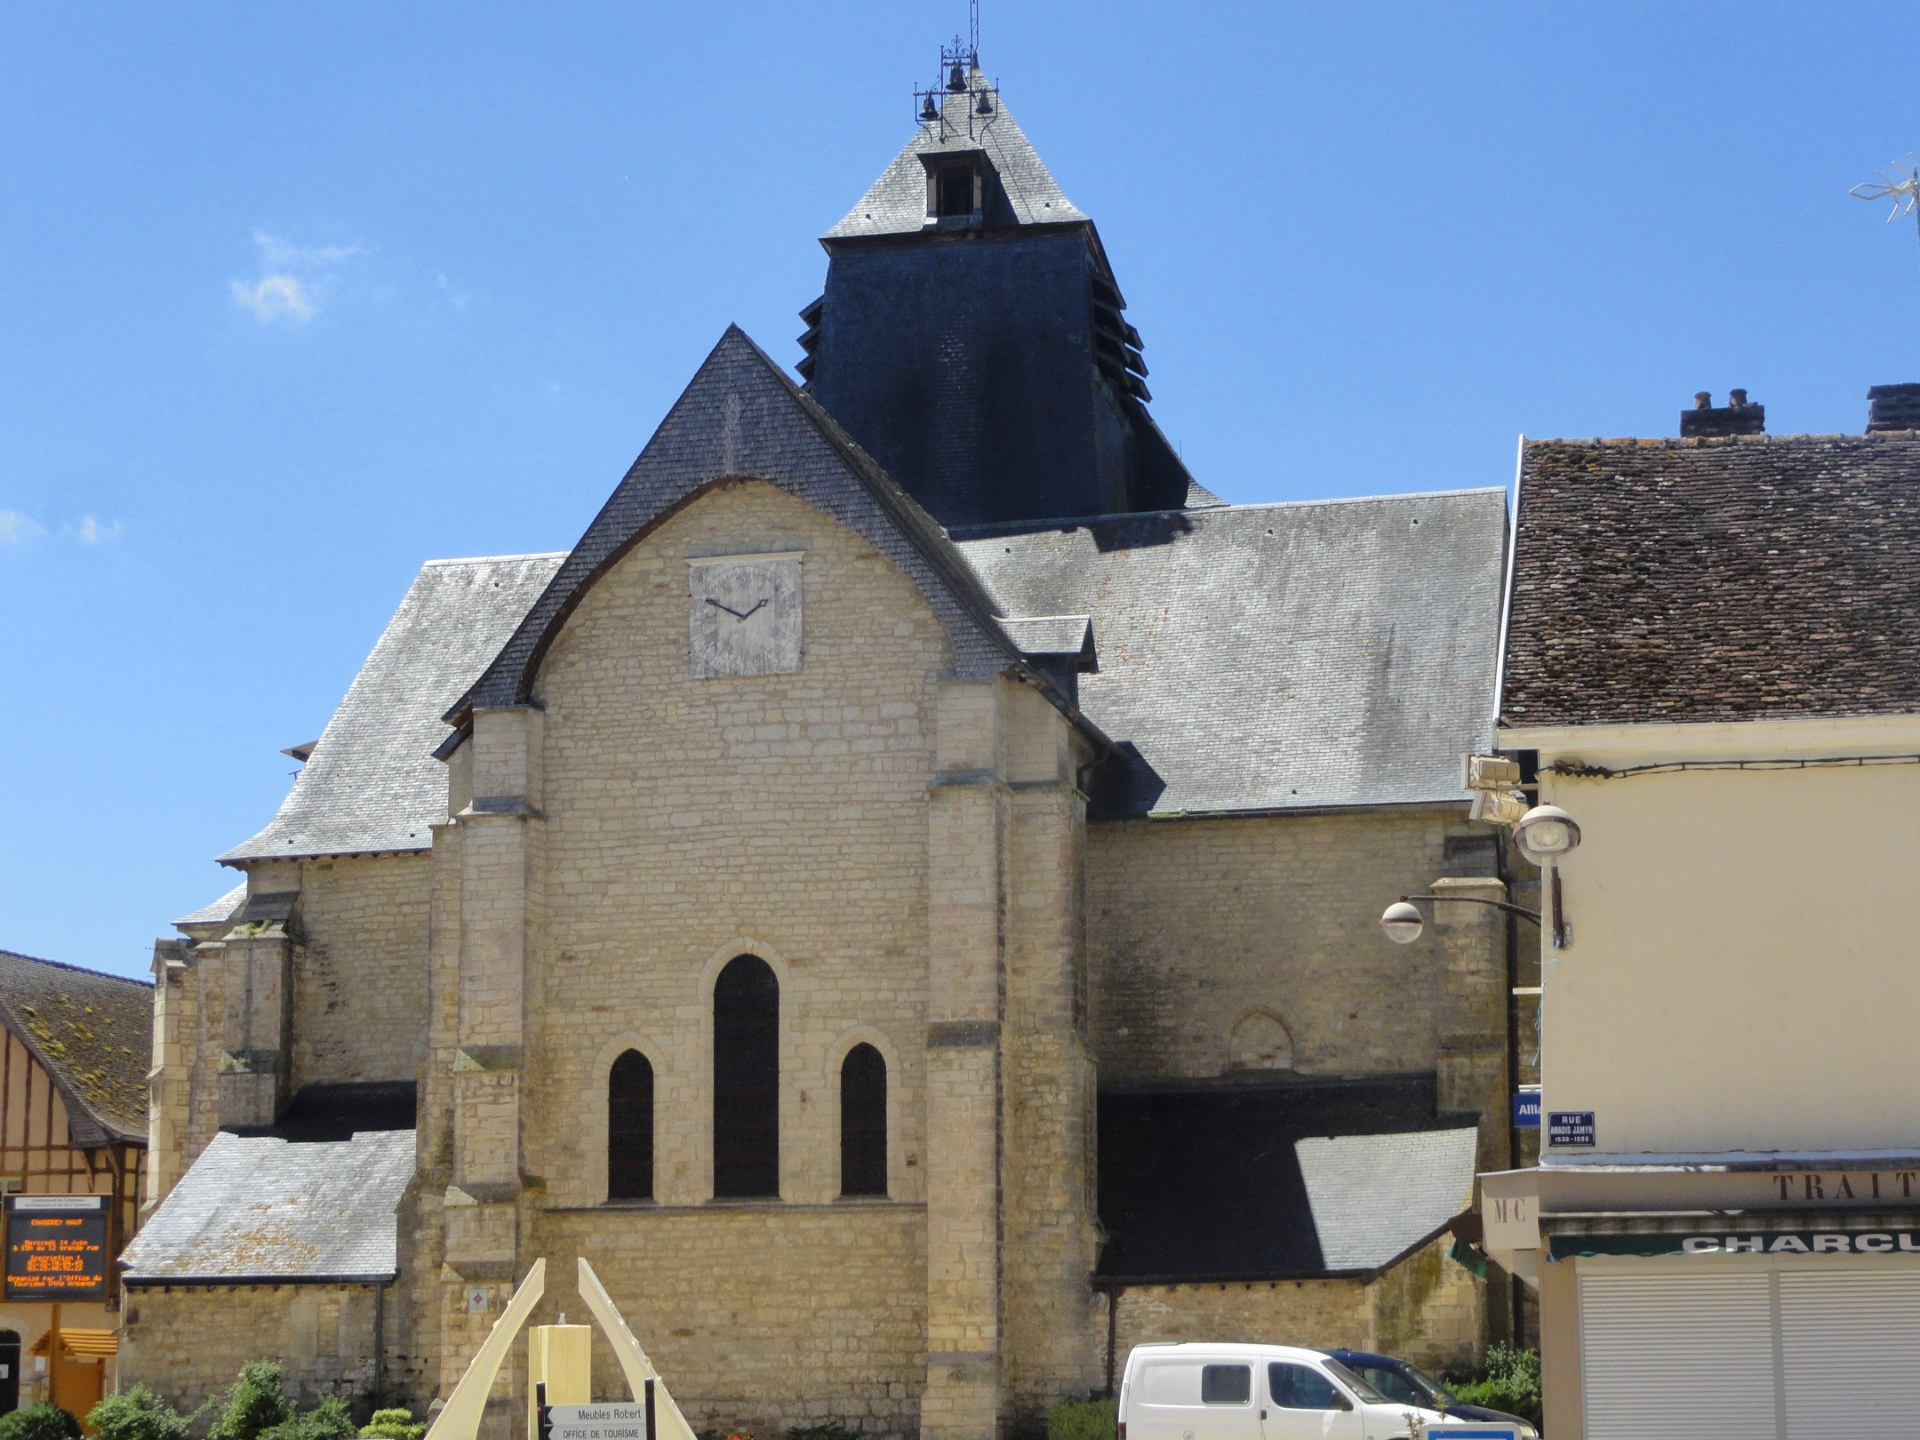 2017-06-16 - Pe#lerinage en Bourgogne - 003